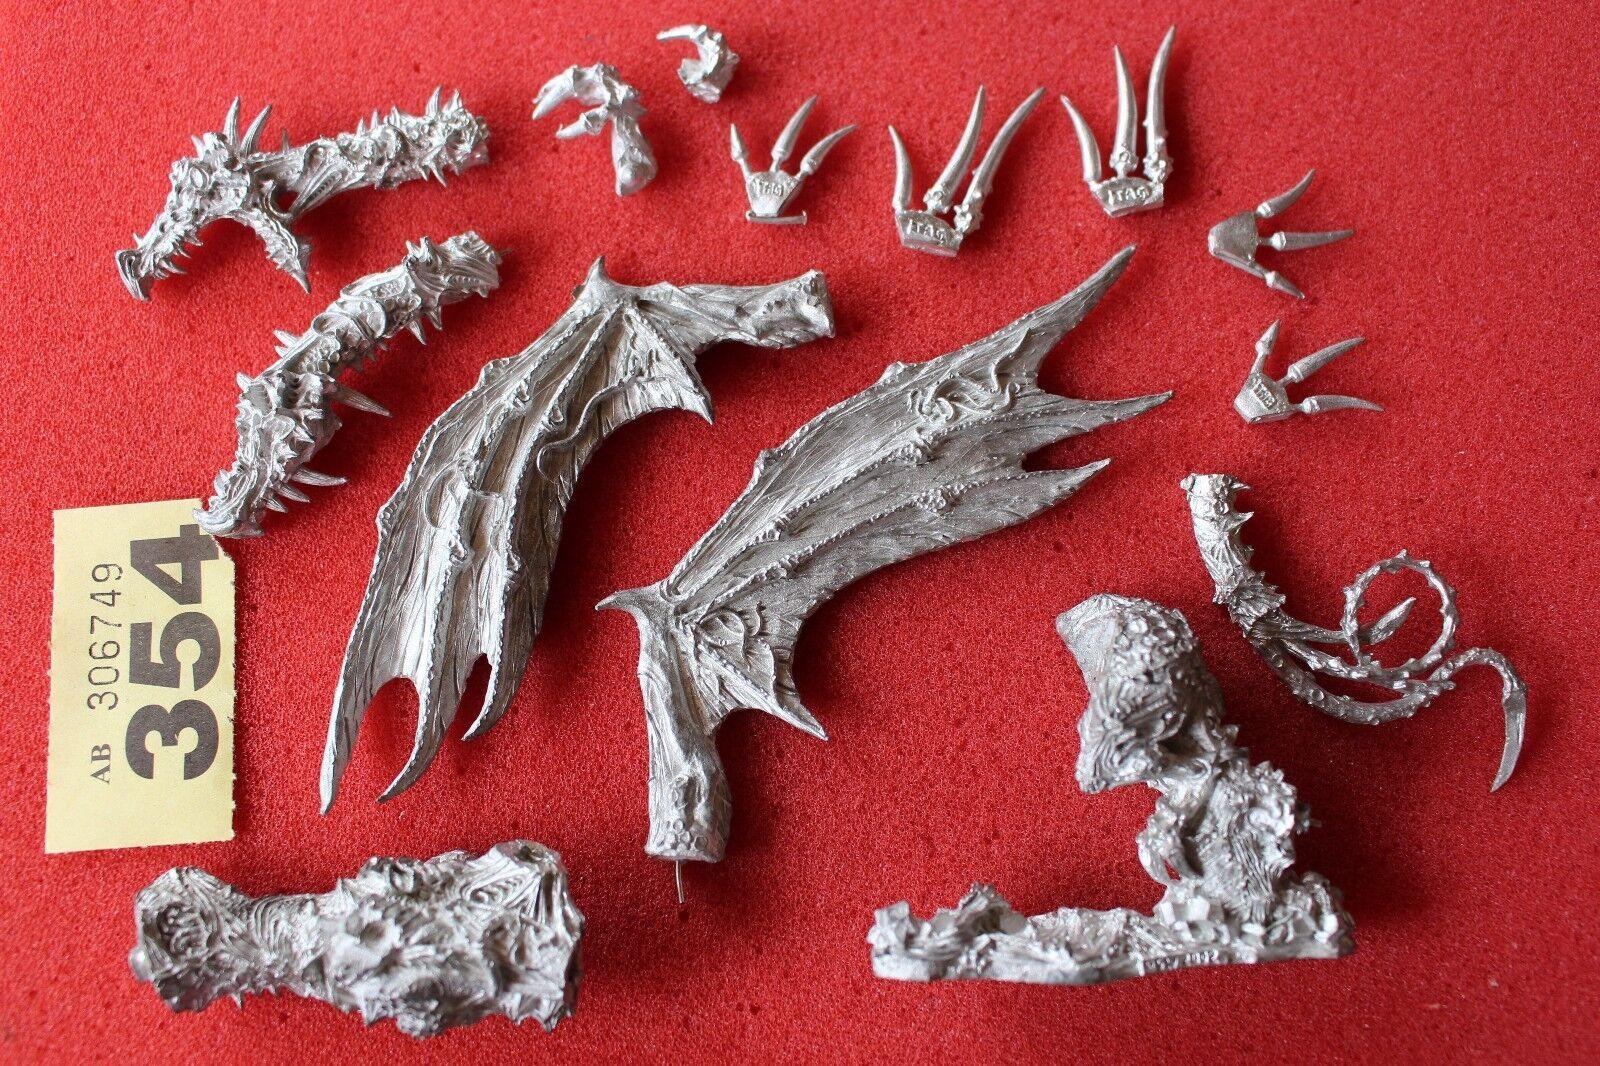 Games Workshop Warhammer Chaos Dragon Galrauch New Complete GW Metal OOP Mint